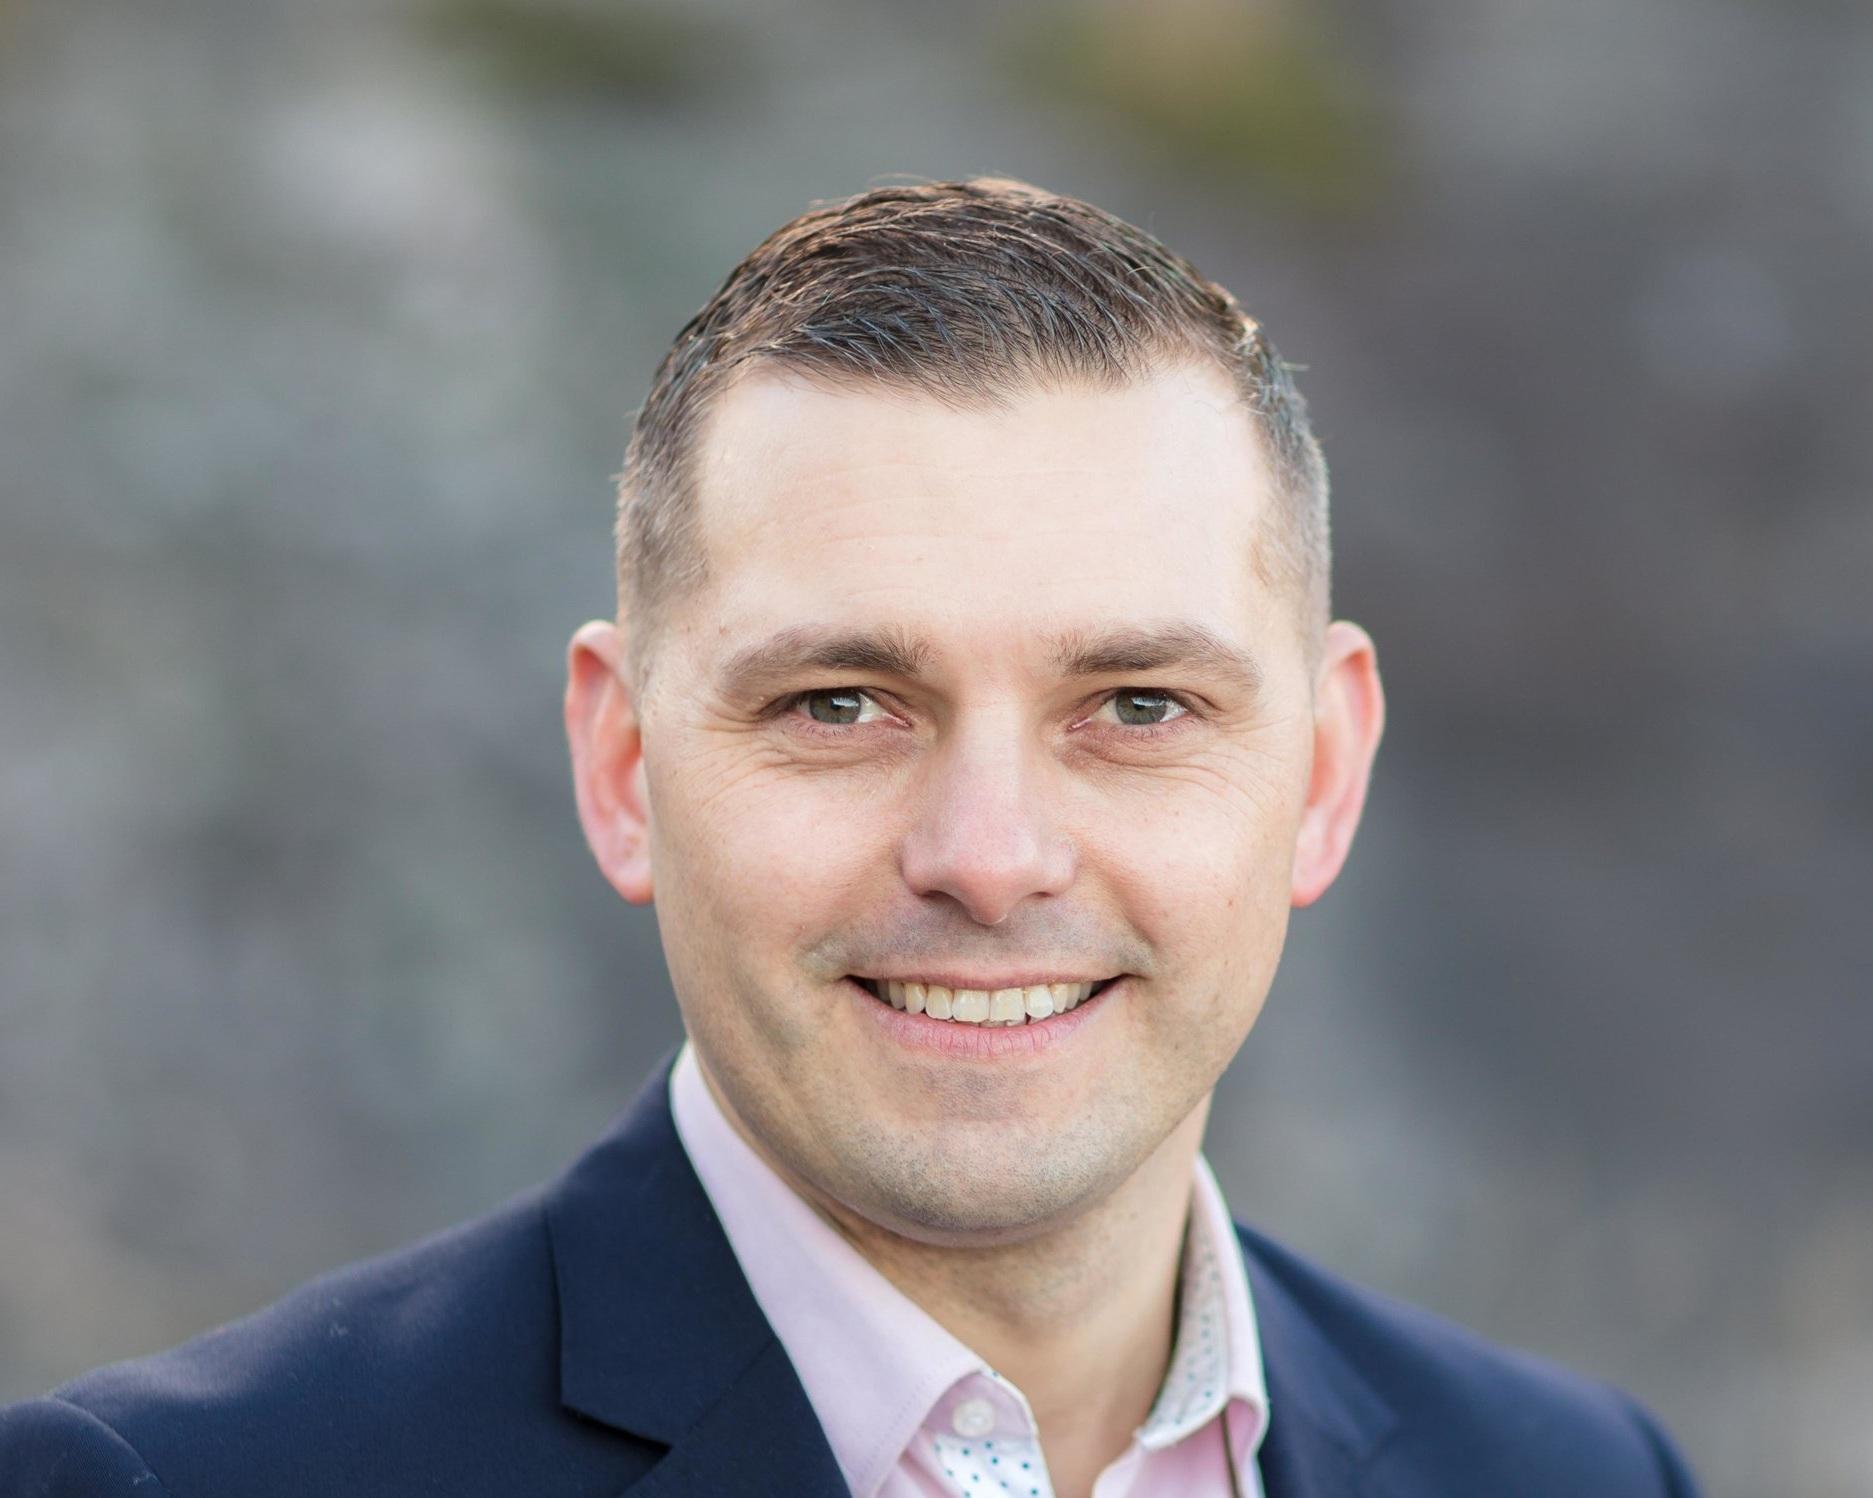 Fredrik Alkenhoff Executive Director, Sales & Marketing  ➤ Kristiansand (Sør Arena) ☎ +47 473 89 454 ✉ fredrik@advantek.no